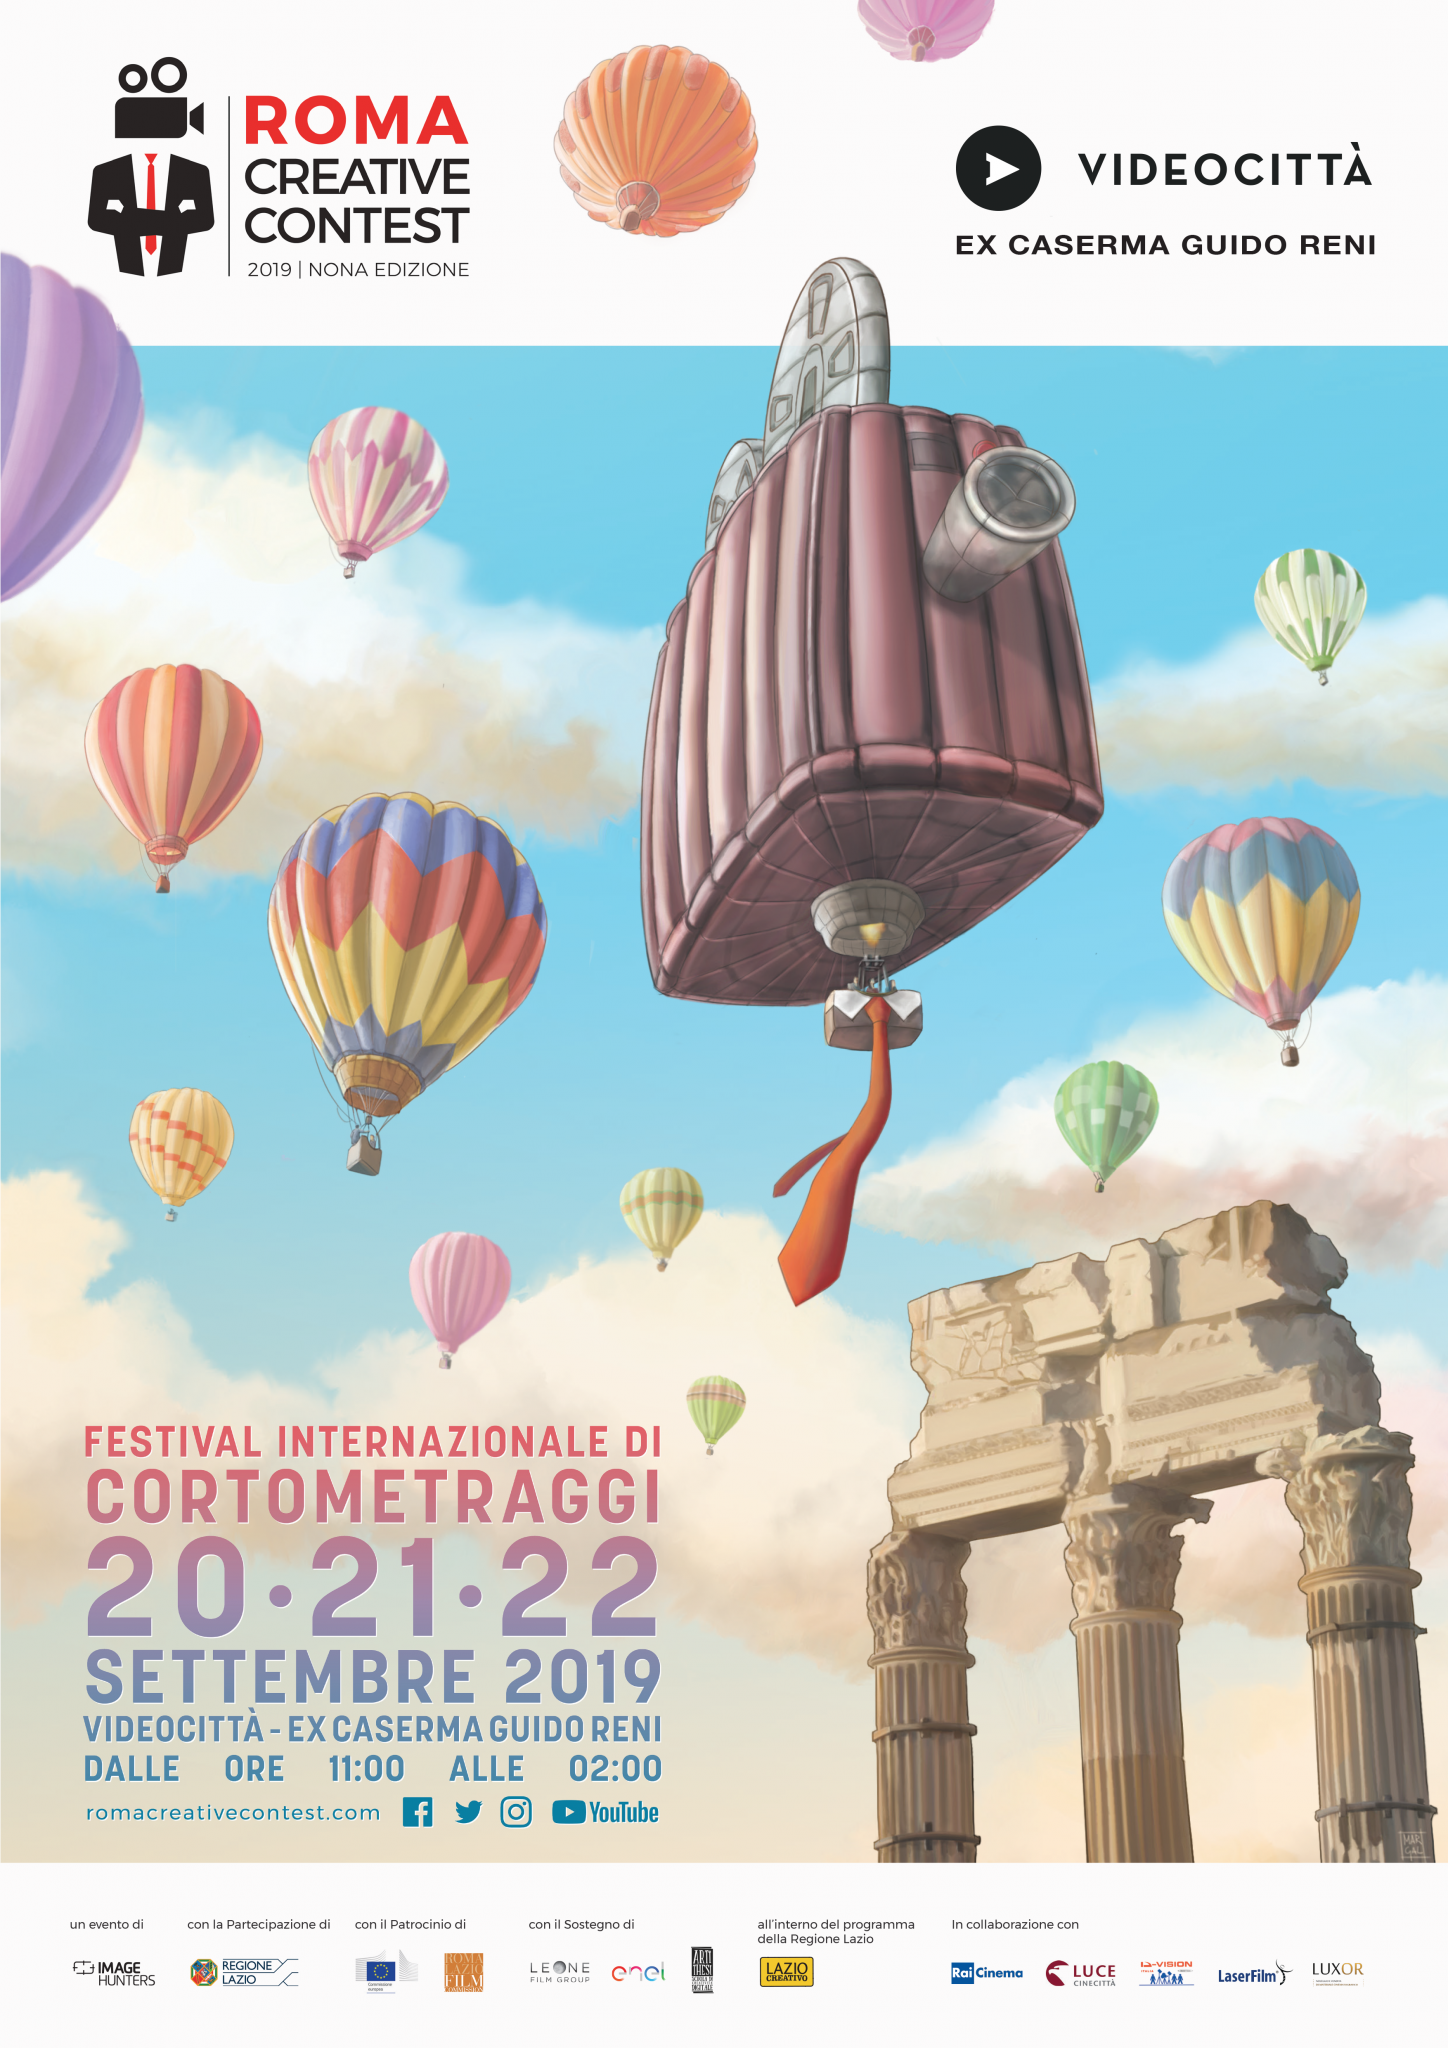 Roma Creative Contest 2019